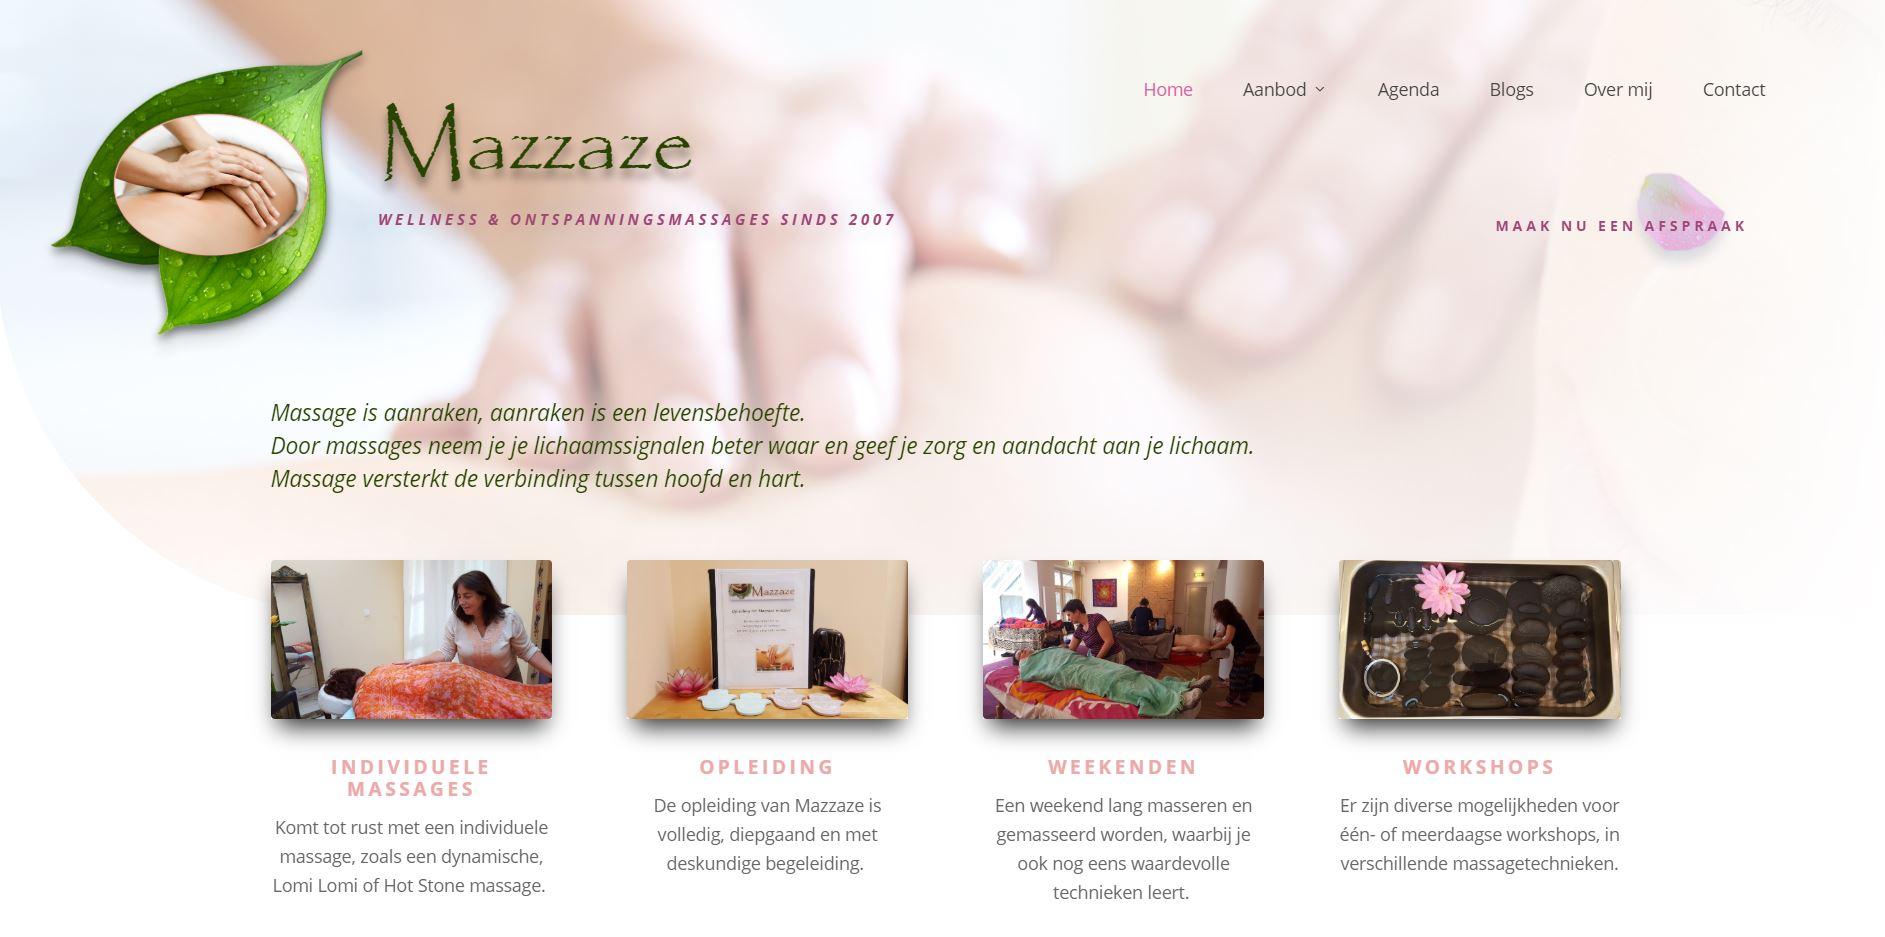 Mazzaze